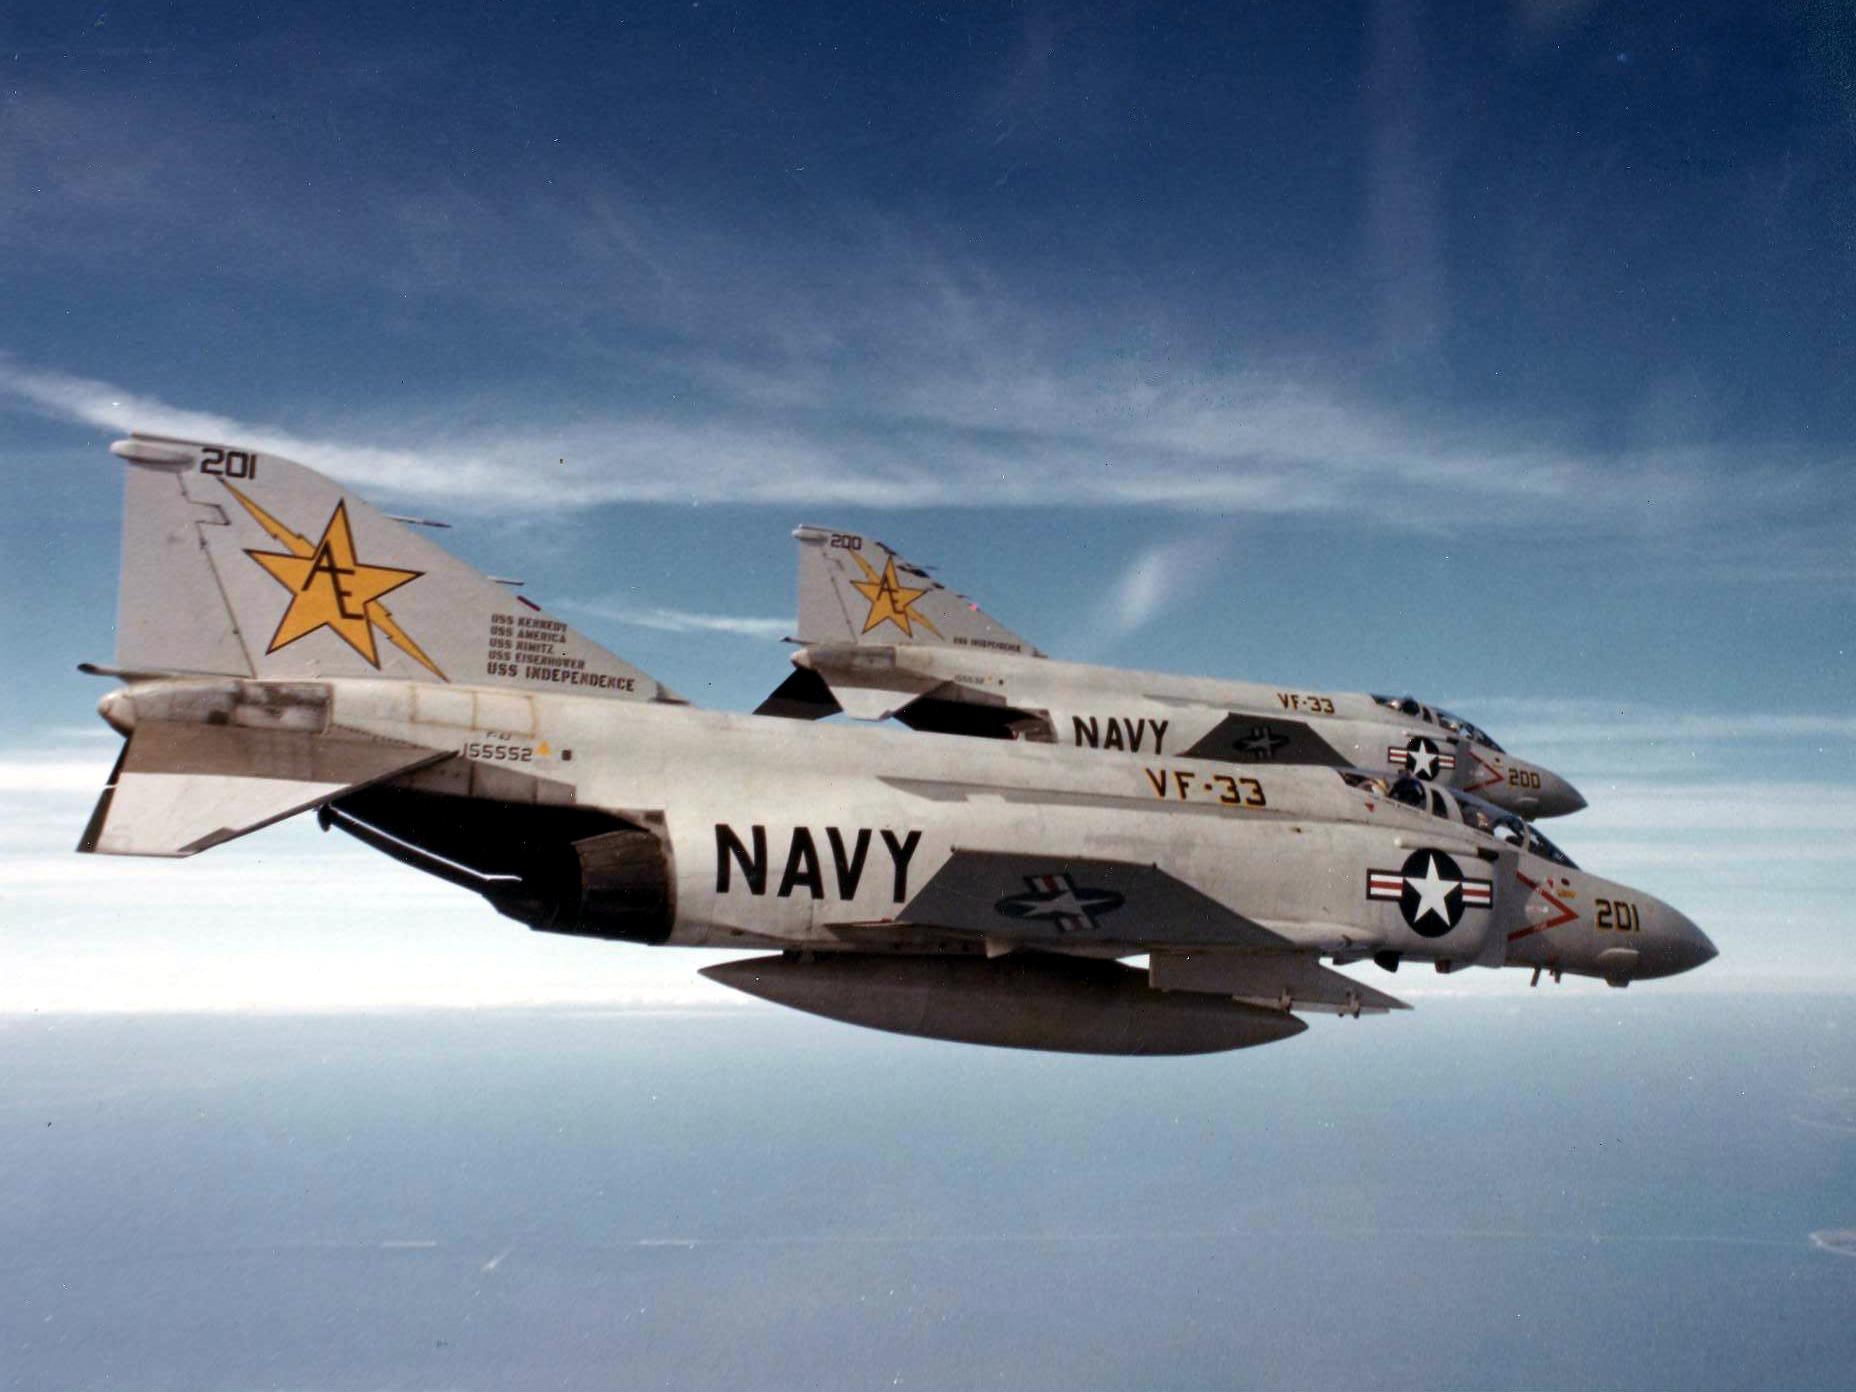 File:F-4J Phantom IIs VF-33 in flight 1979.jpg - Wikimedia Commons